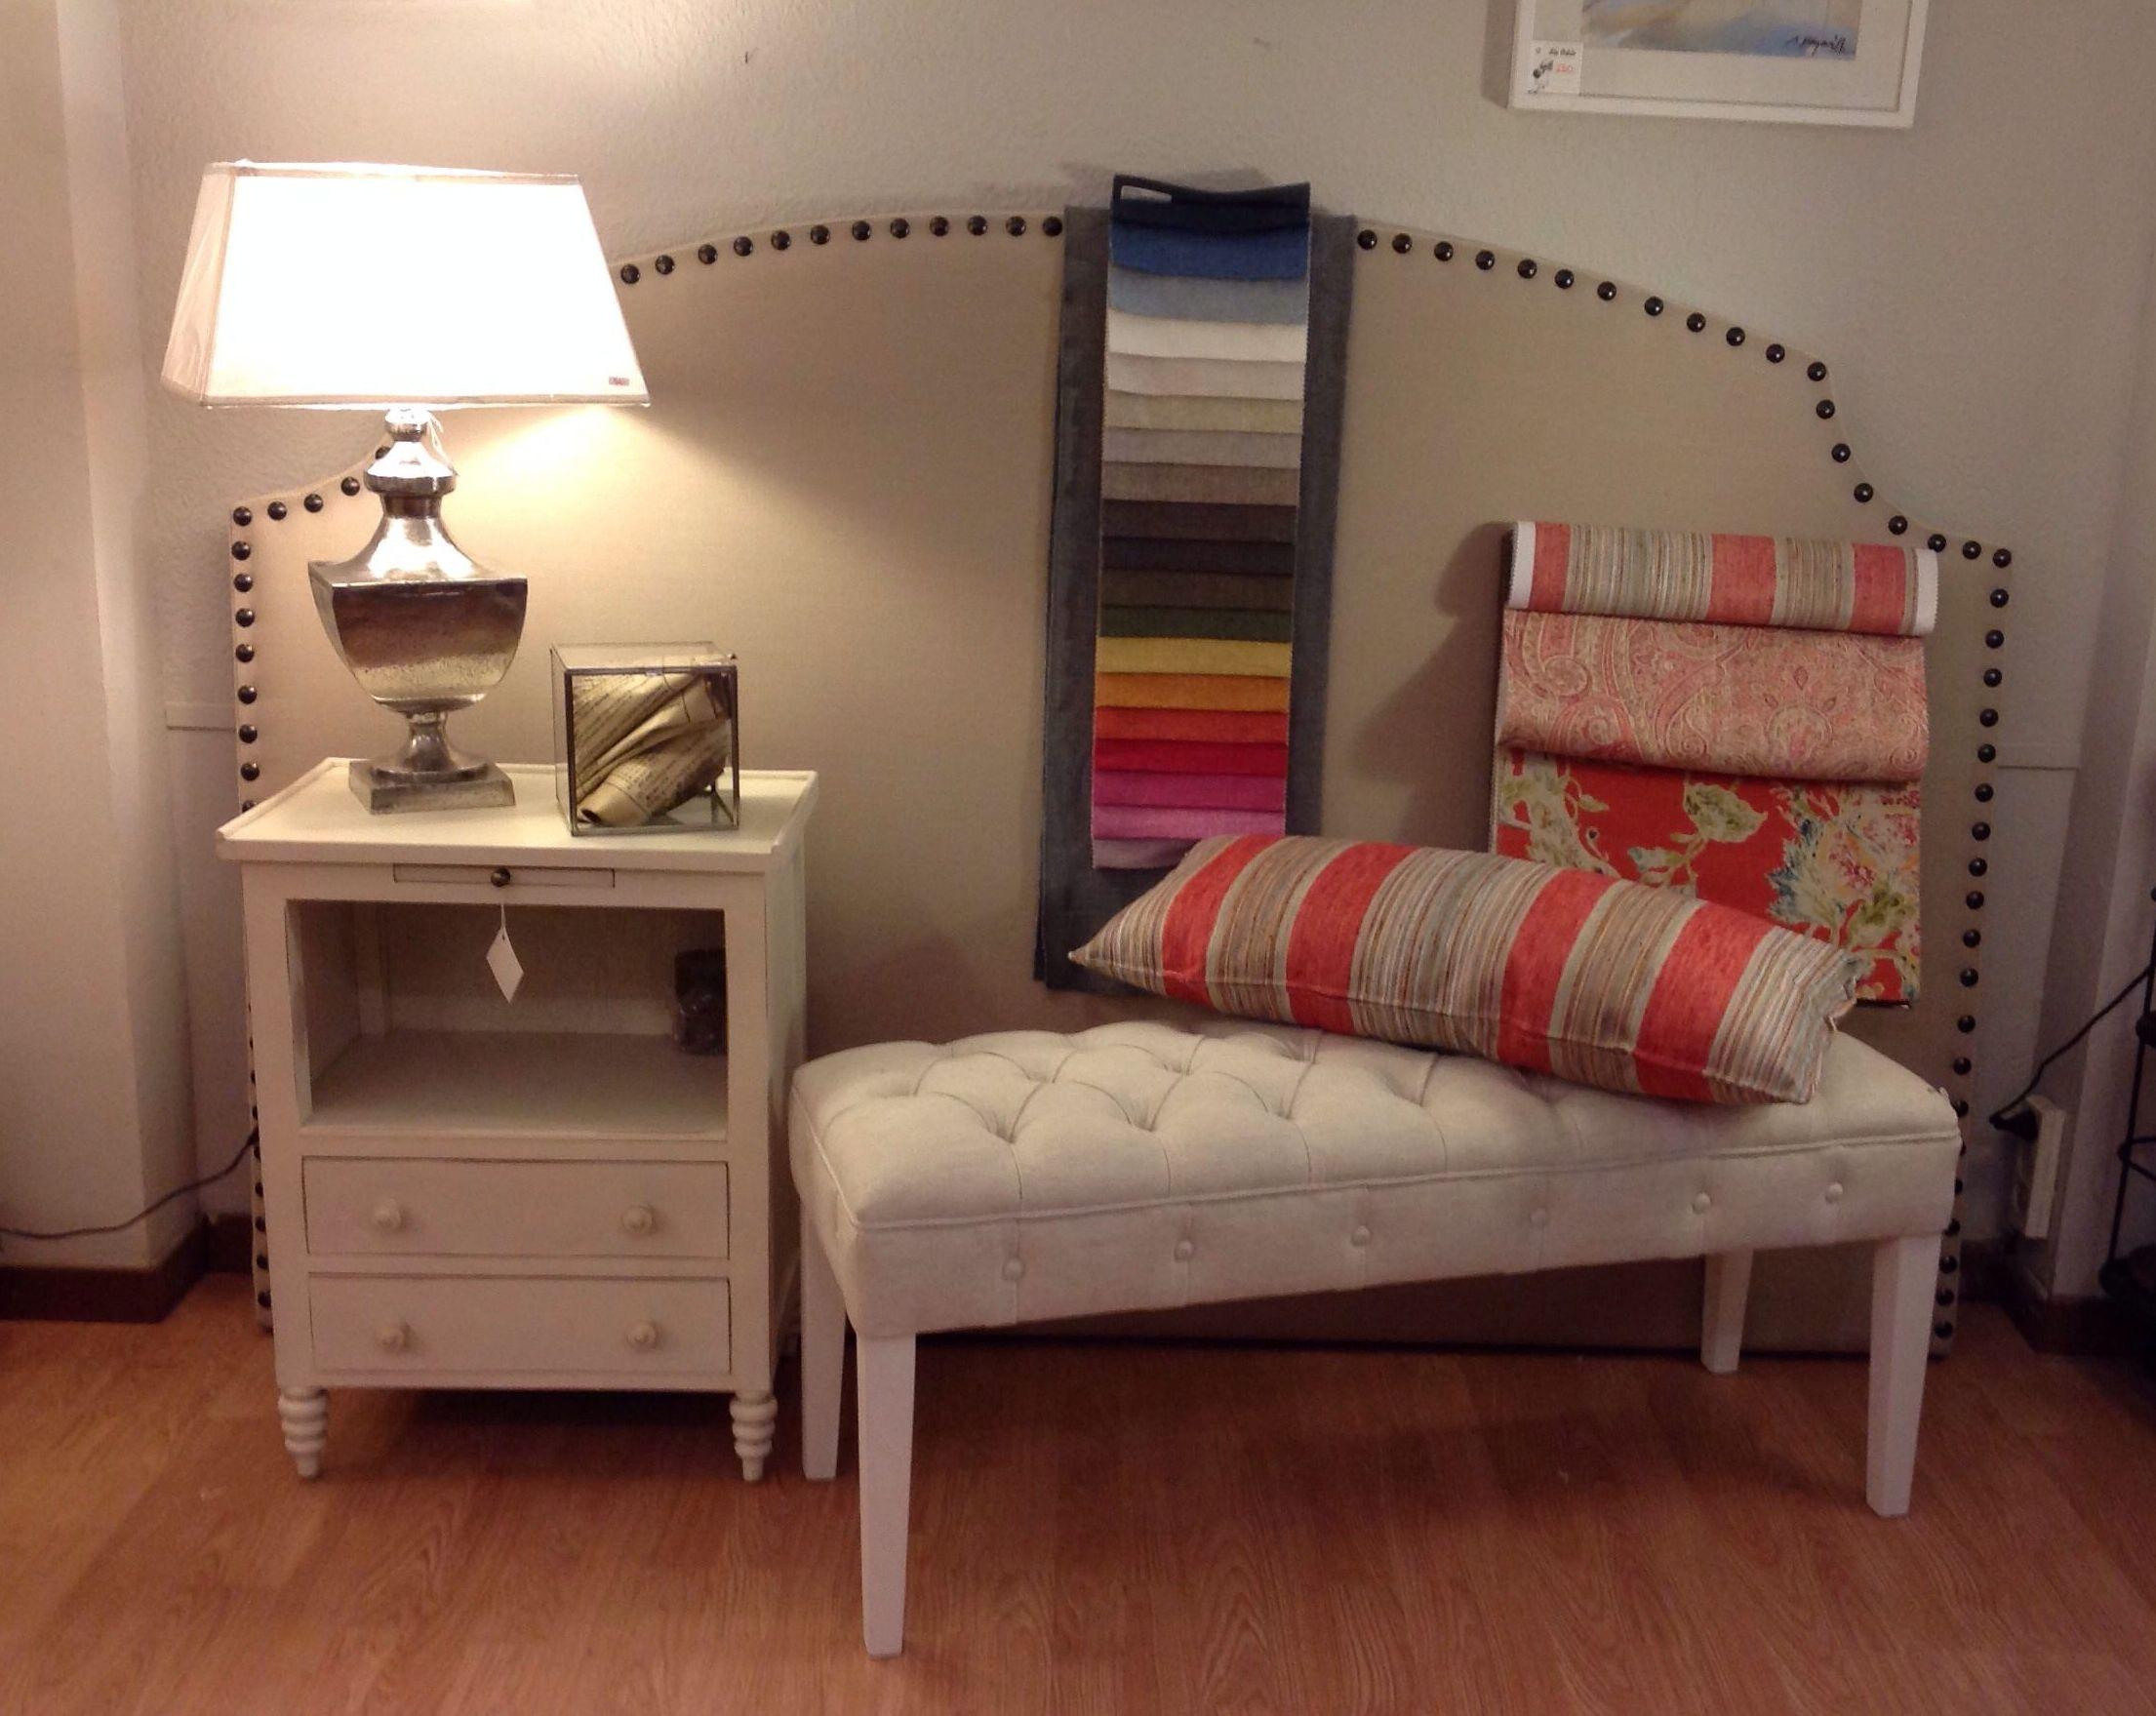 Cabecero tapizado con tachuelas y tela de lino cat logo - Telas para tapizar cabeceros ...